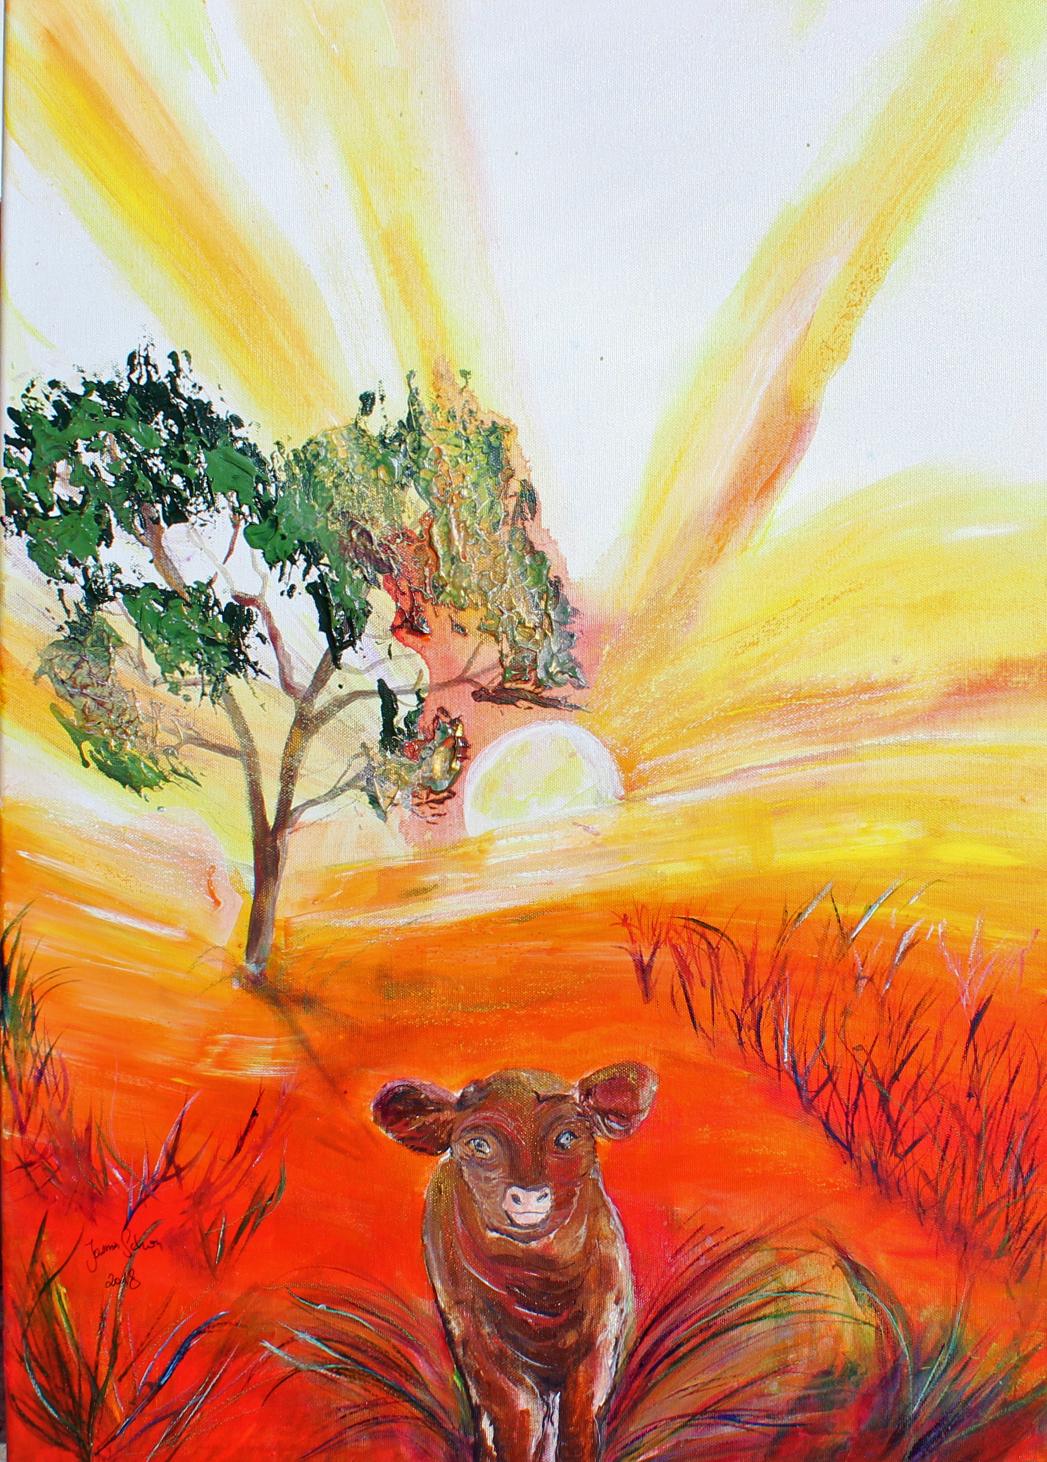 Der Morgenspaziergang, Mixed Art: Acryl & Kreide auf Leinwand, 70 x 50 cm